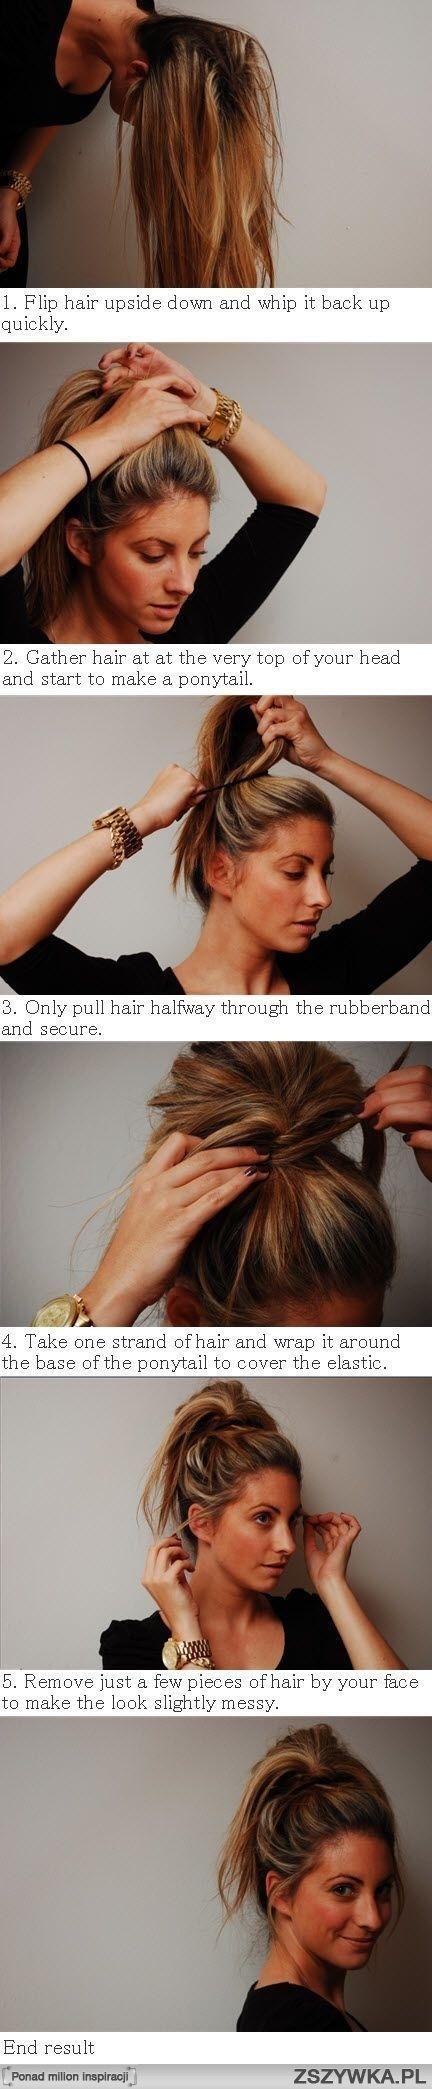 diy, diy projects, diy craft, handmade, diy messy bun ponytail hybrid hairstyle